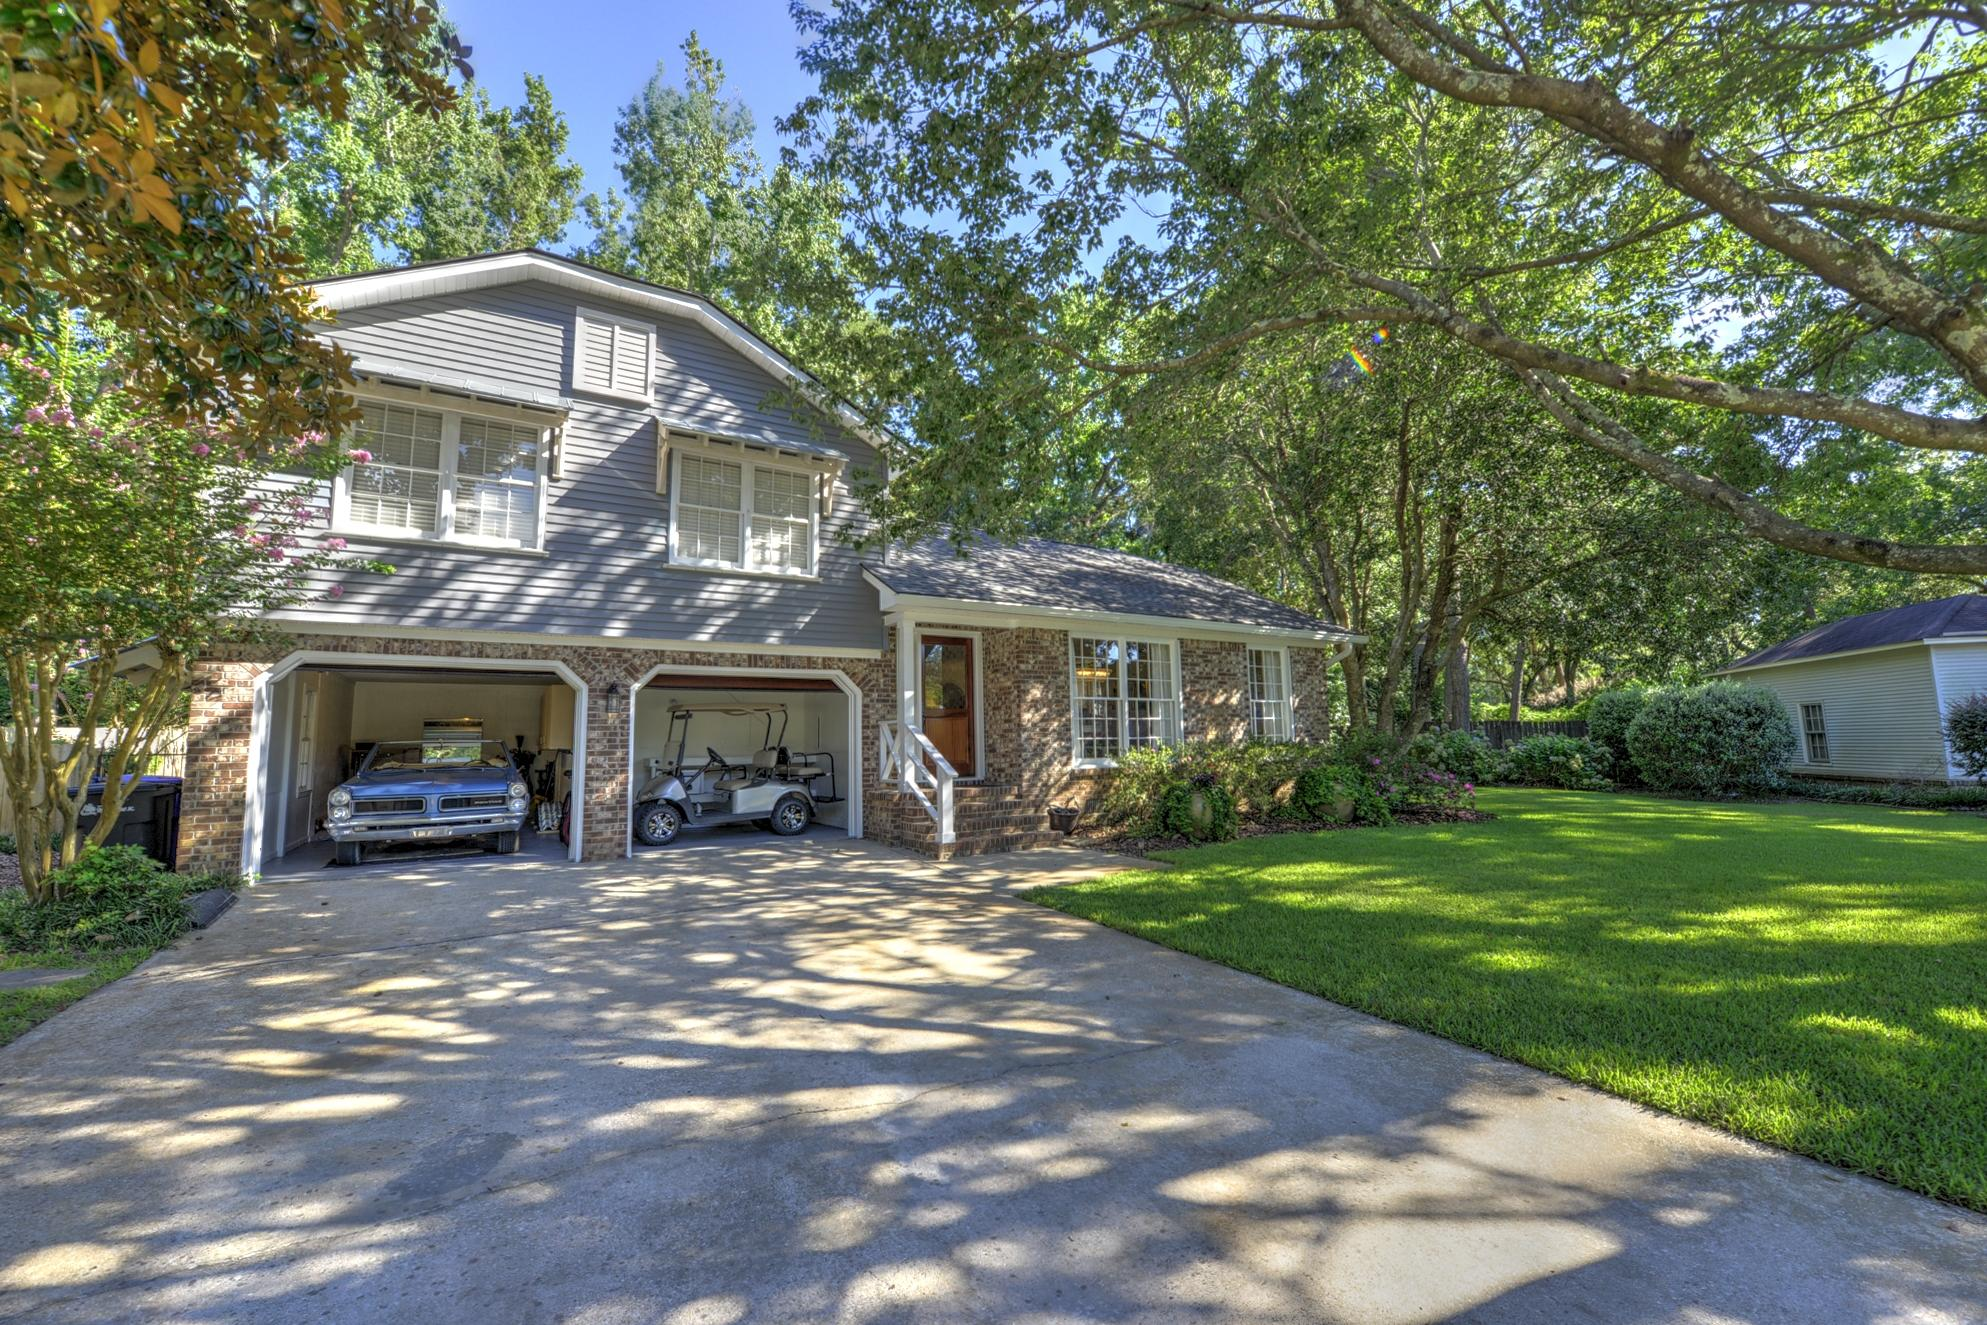 Shemwood II Homes For Sale - 1017 Jack Snipe, Mount Pleasant, SC - 8